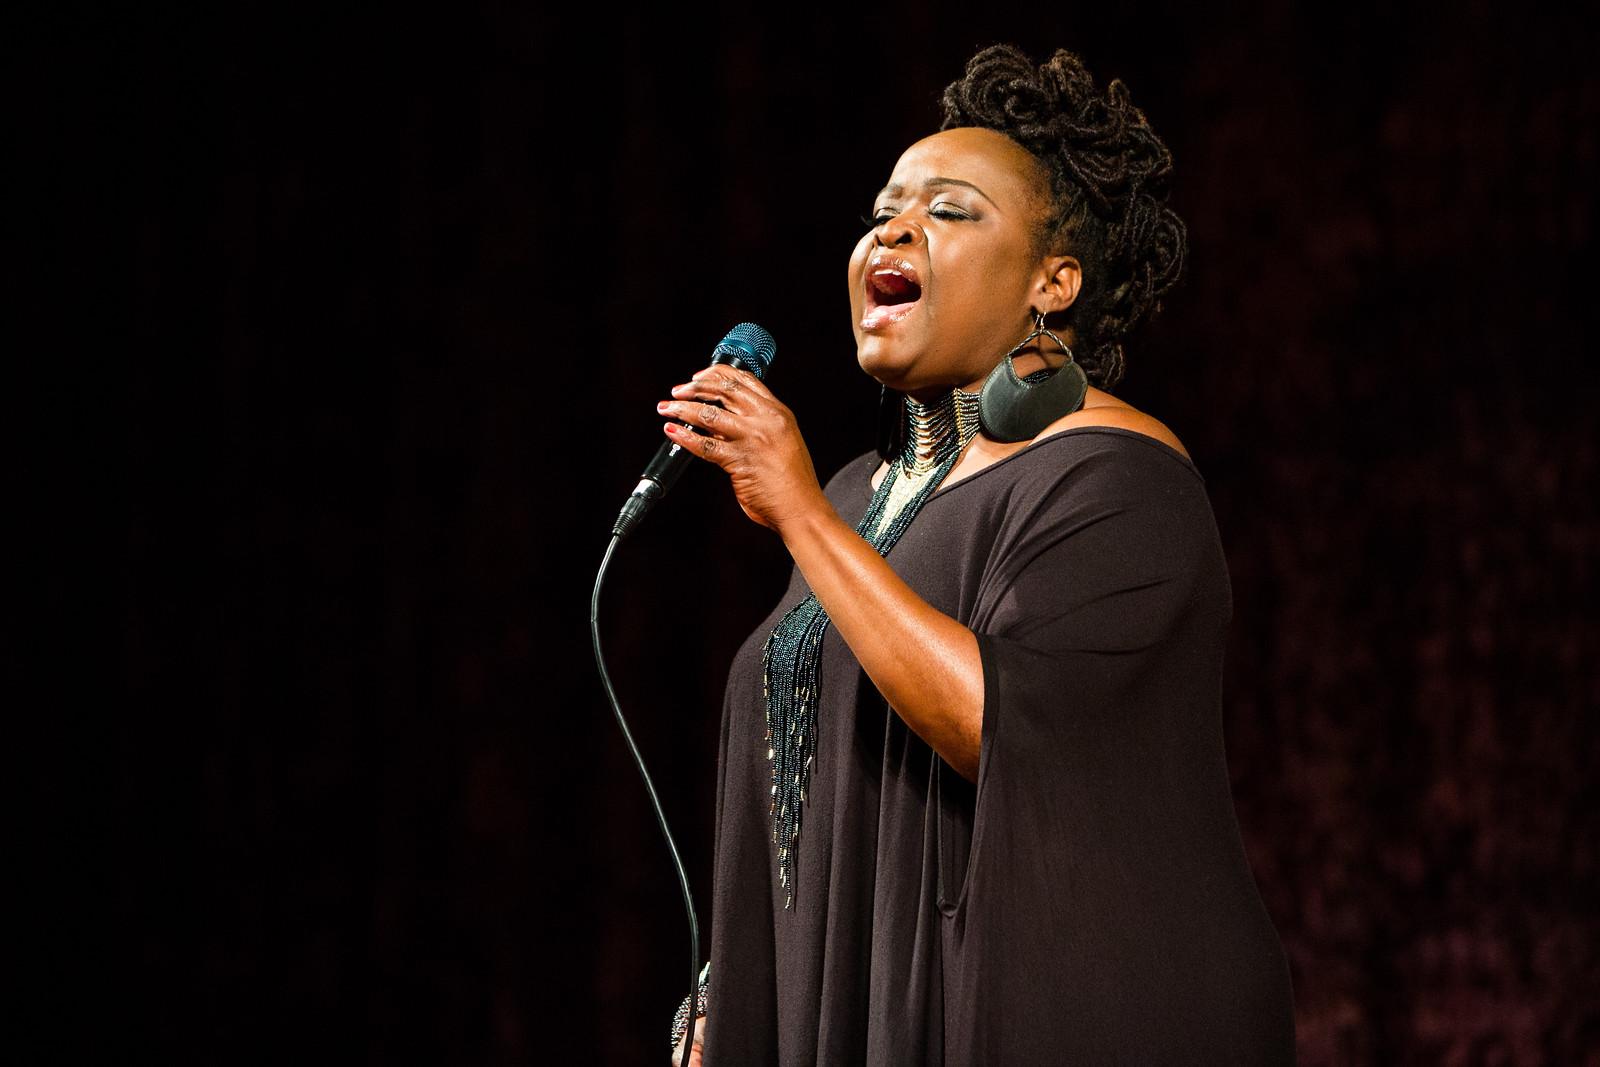 Living-Jazz-MLK-Tribute-2017-Oakland-by-Rosaura-Studios-02-X3.jpg